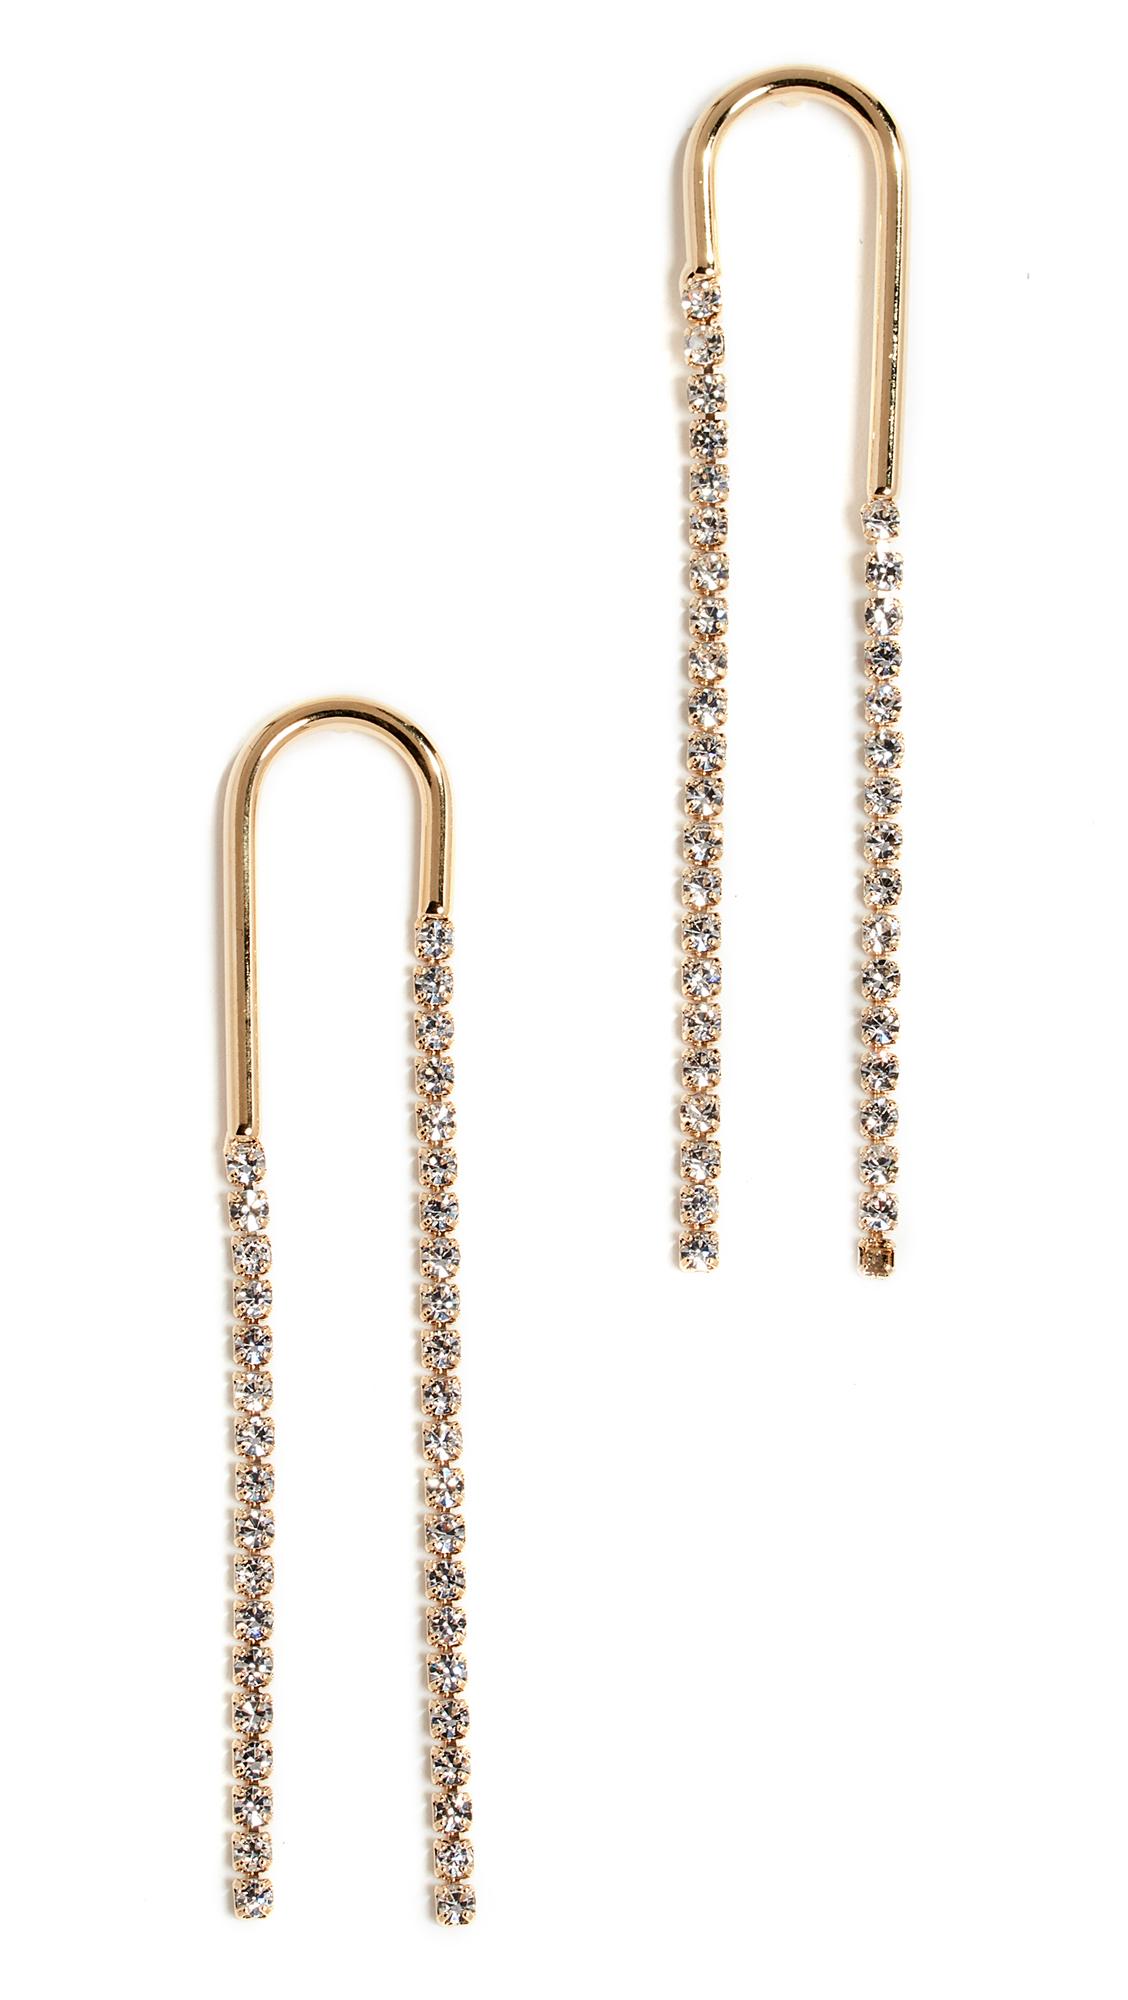 CLOVERPOST Swoop Earrings in Gold